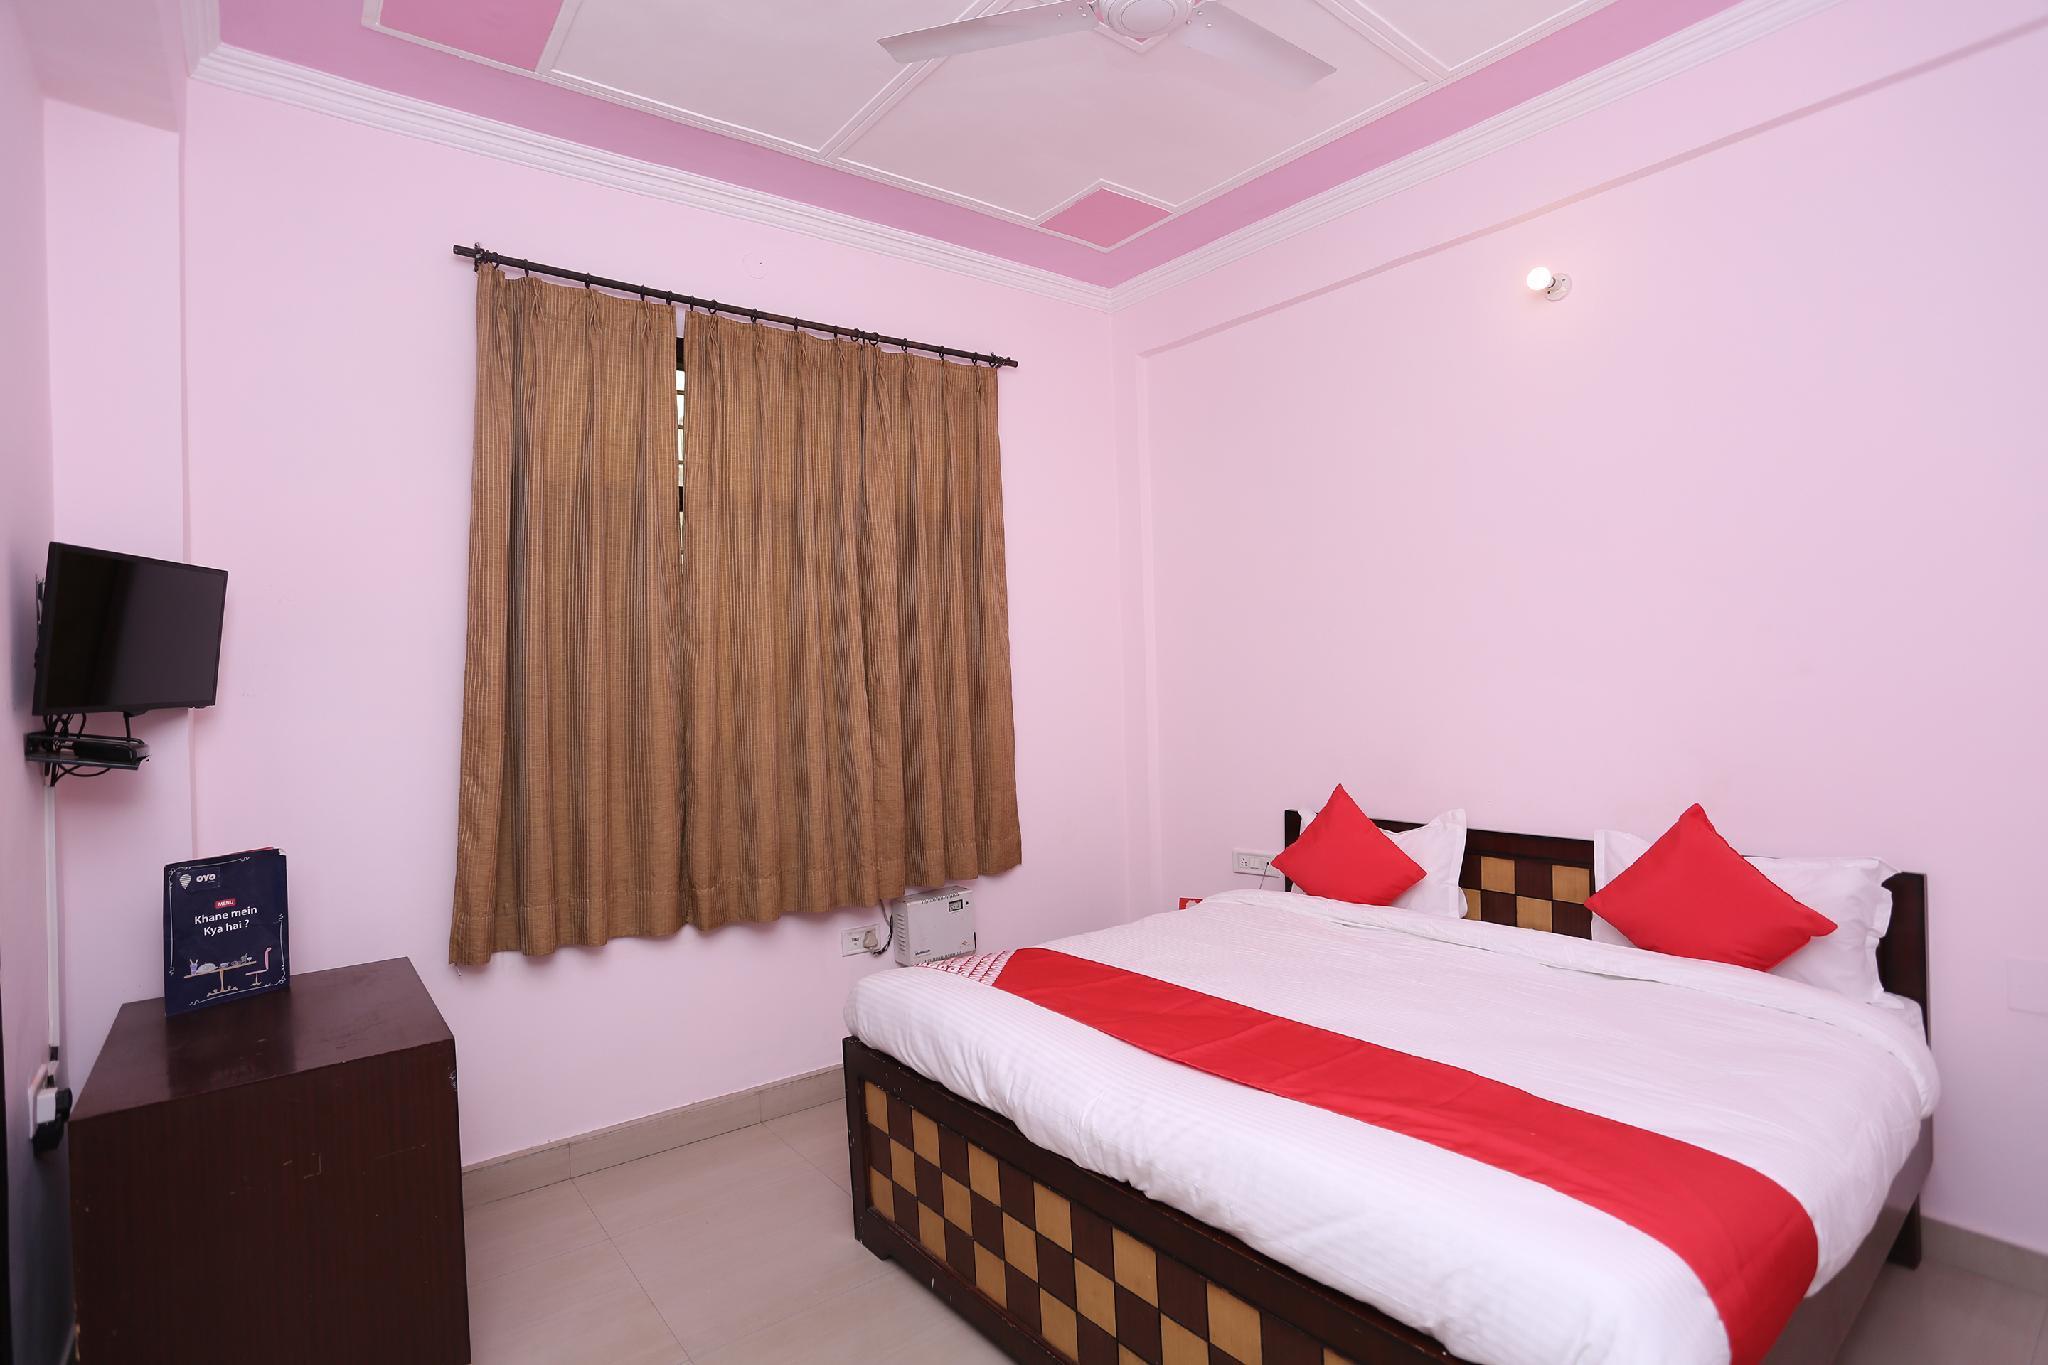 OYO 15481 Hotel Star, Karnal